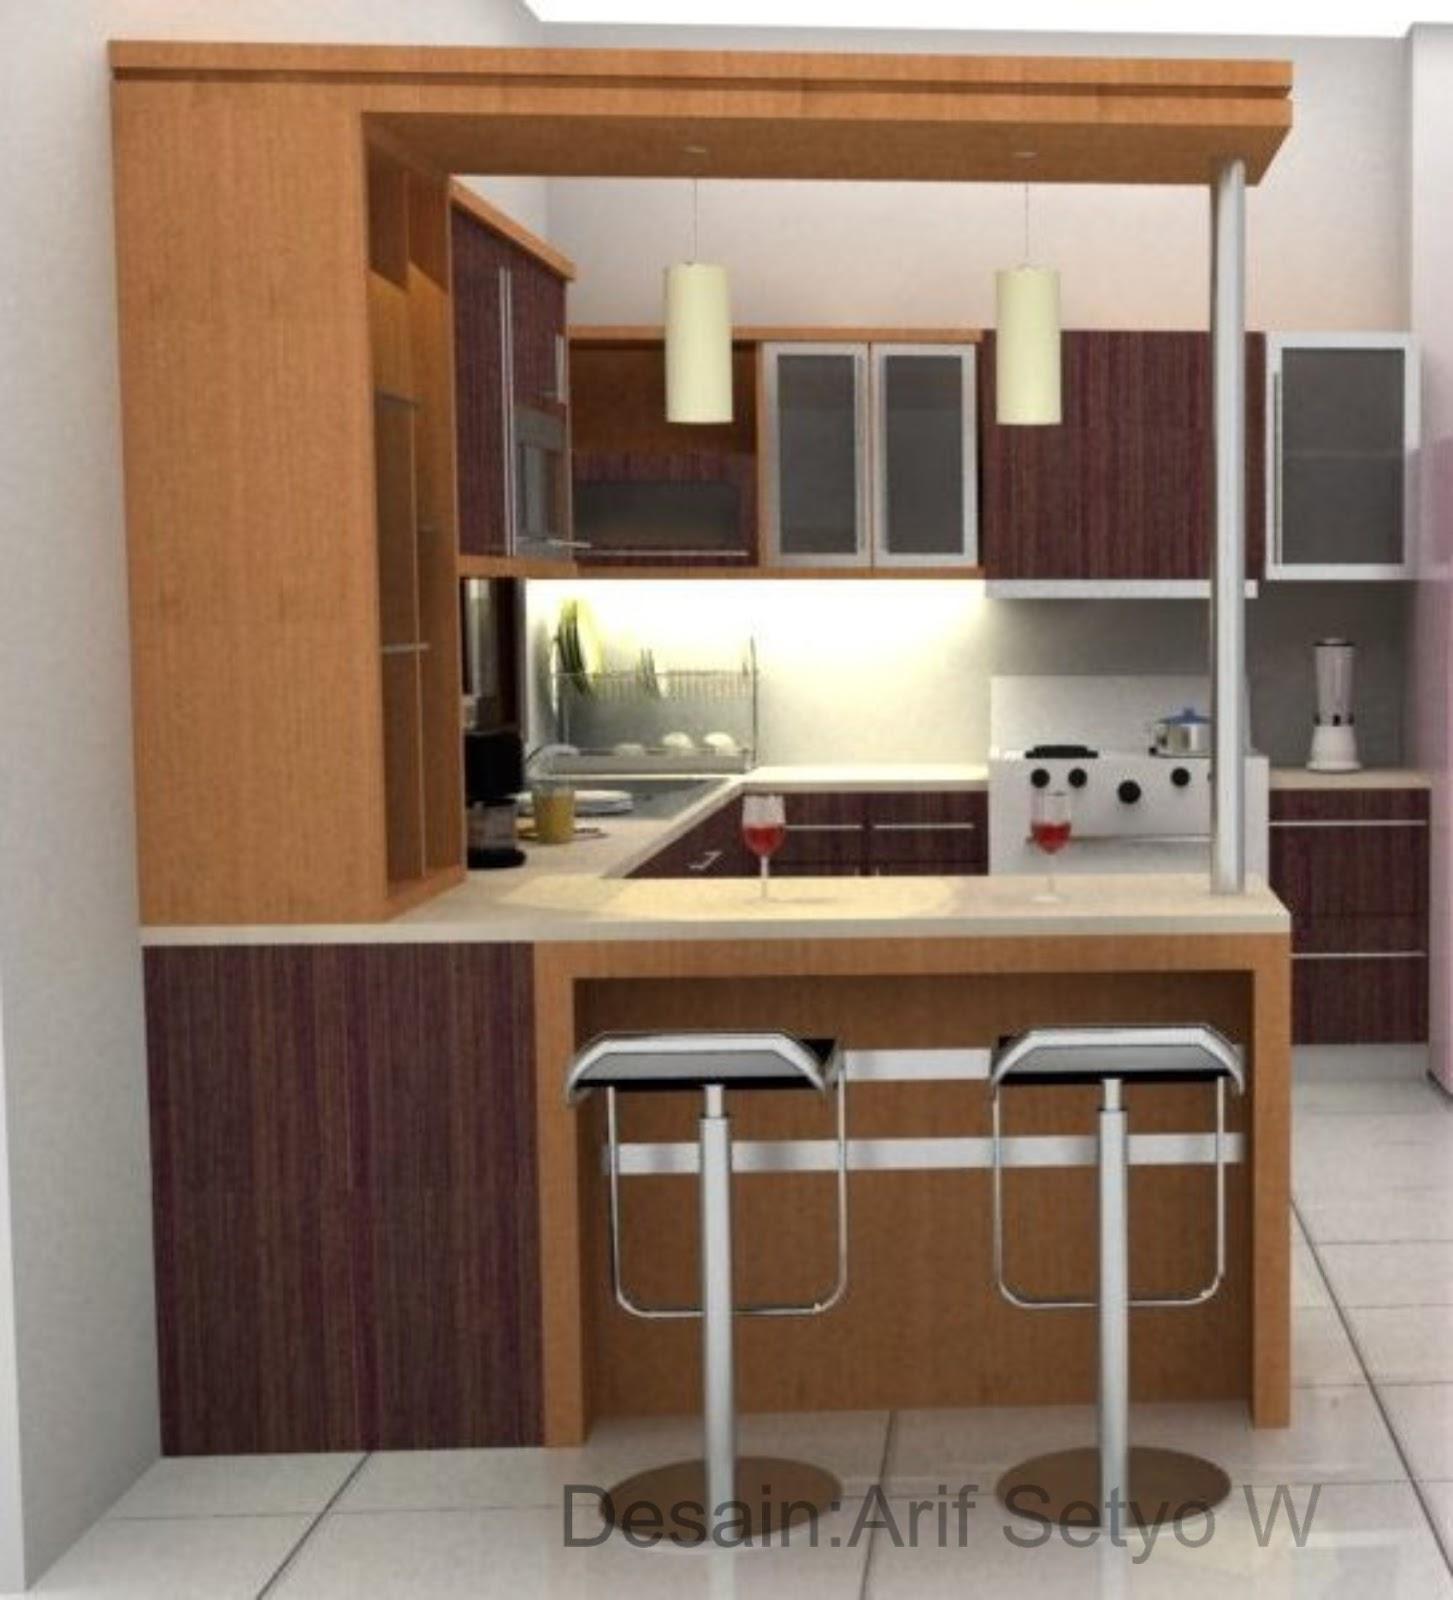 Kitchen Set Ruang Kecil: DESAIN DAPUR DAN KITCHEN SET